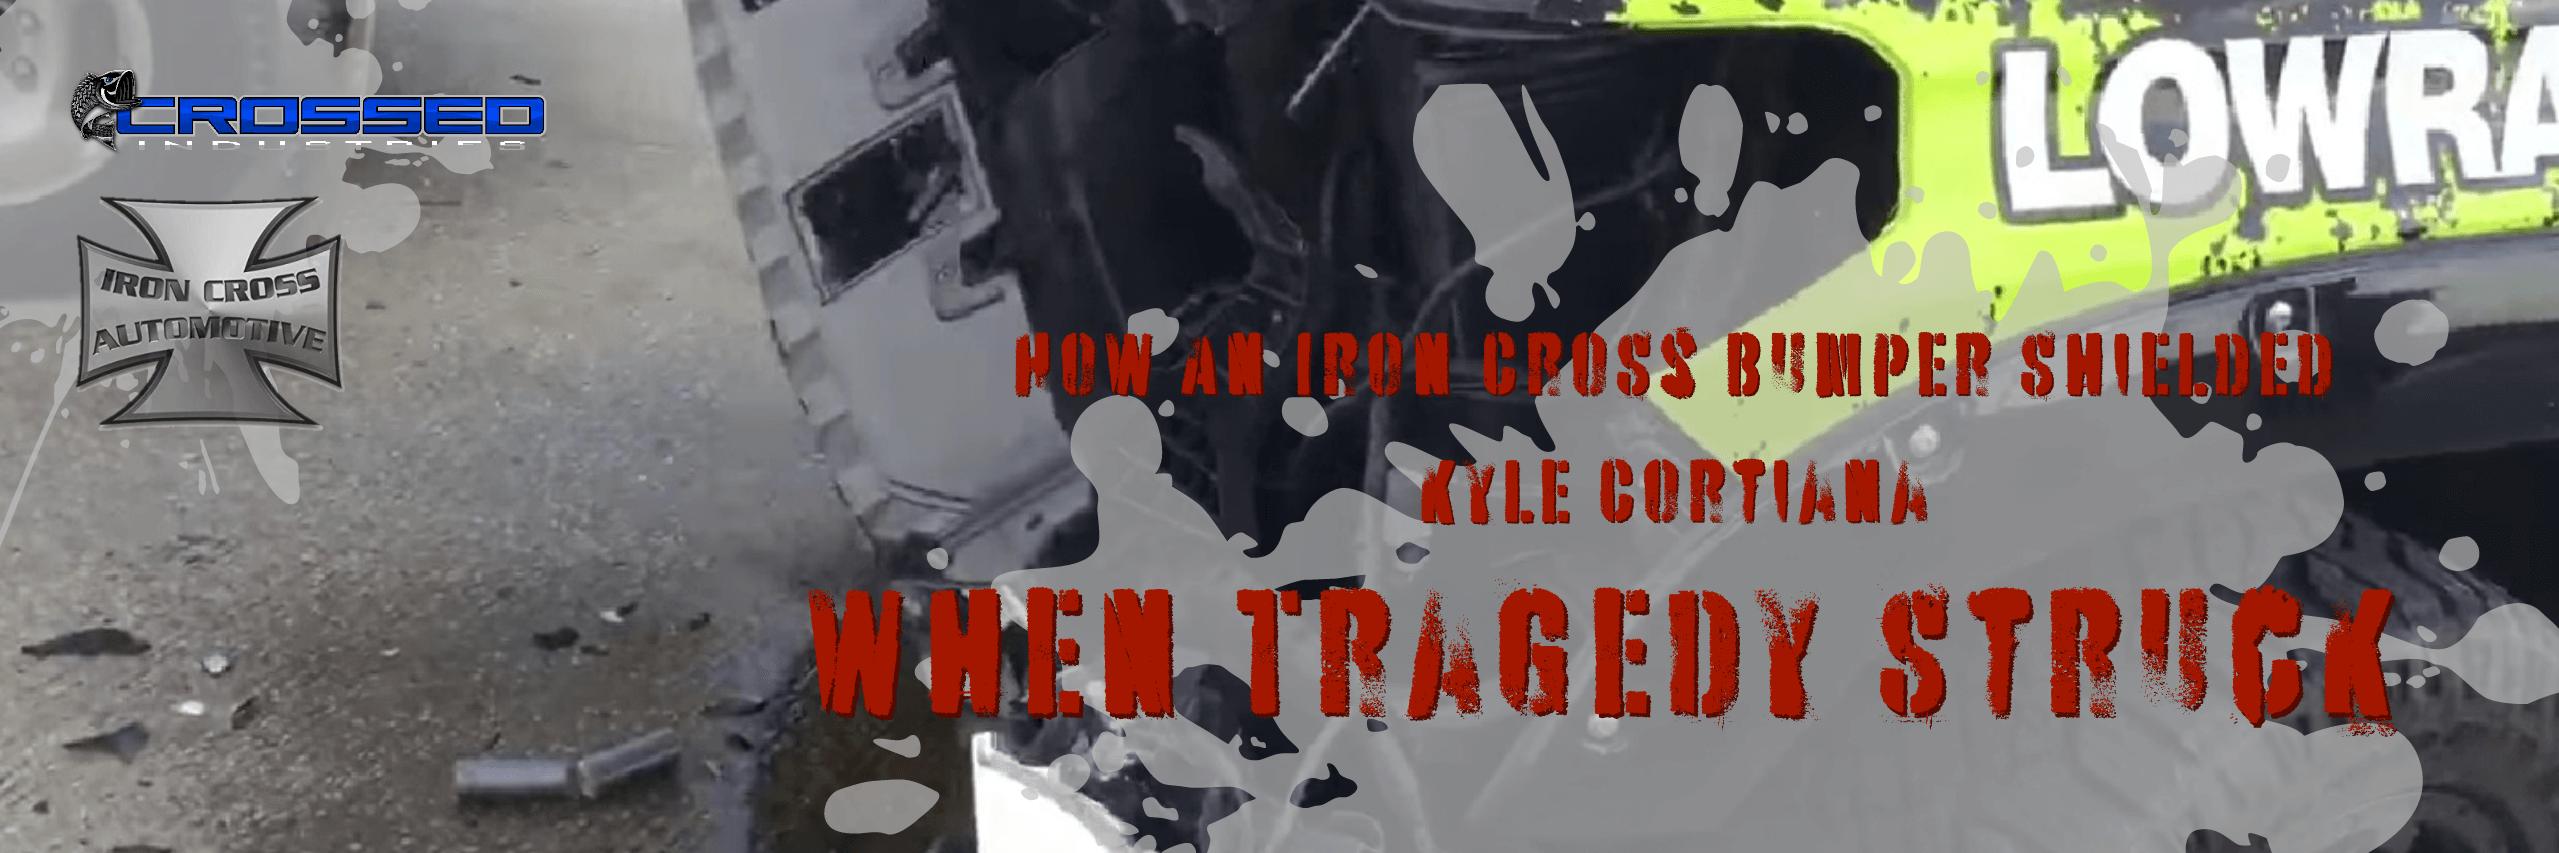 How An Iron Cross Bumper Shielded Kyle Cortiana - Adobe Post 20190725 162506